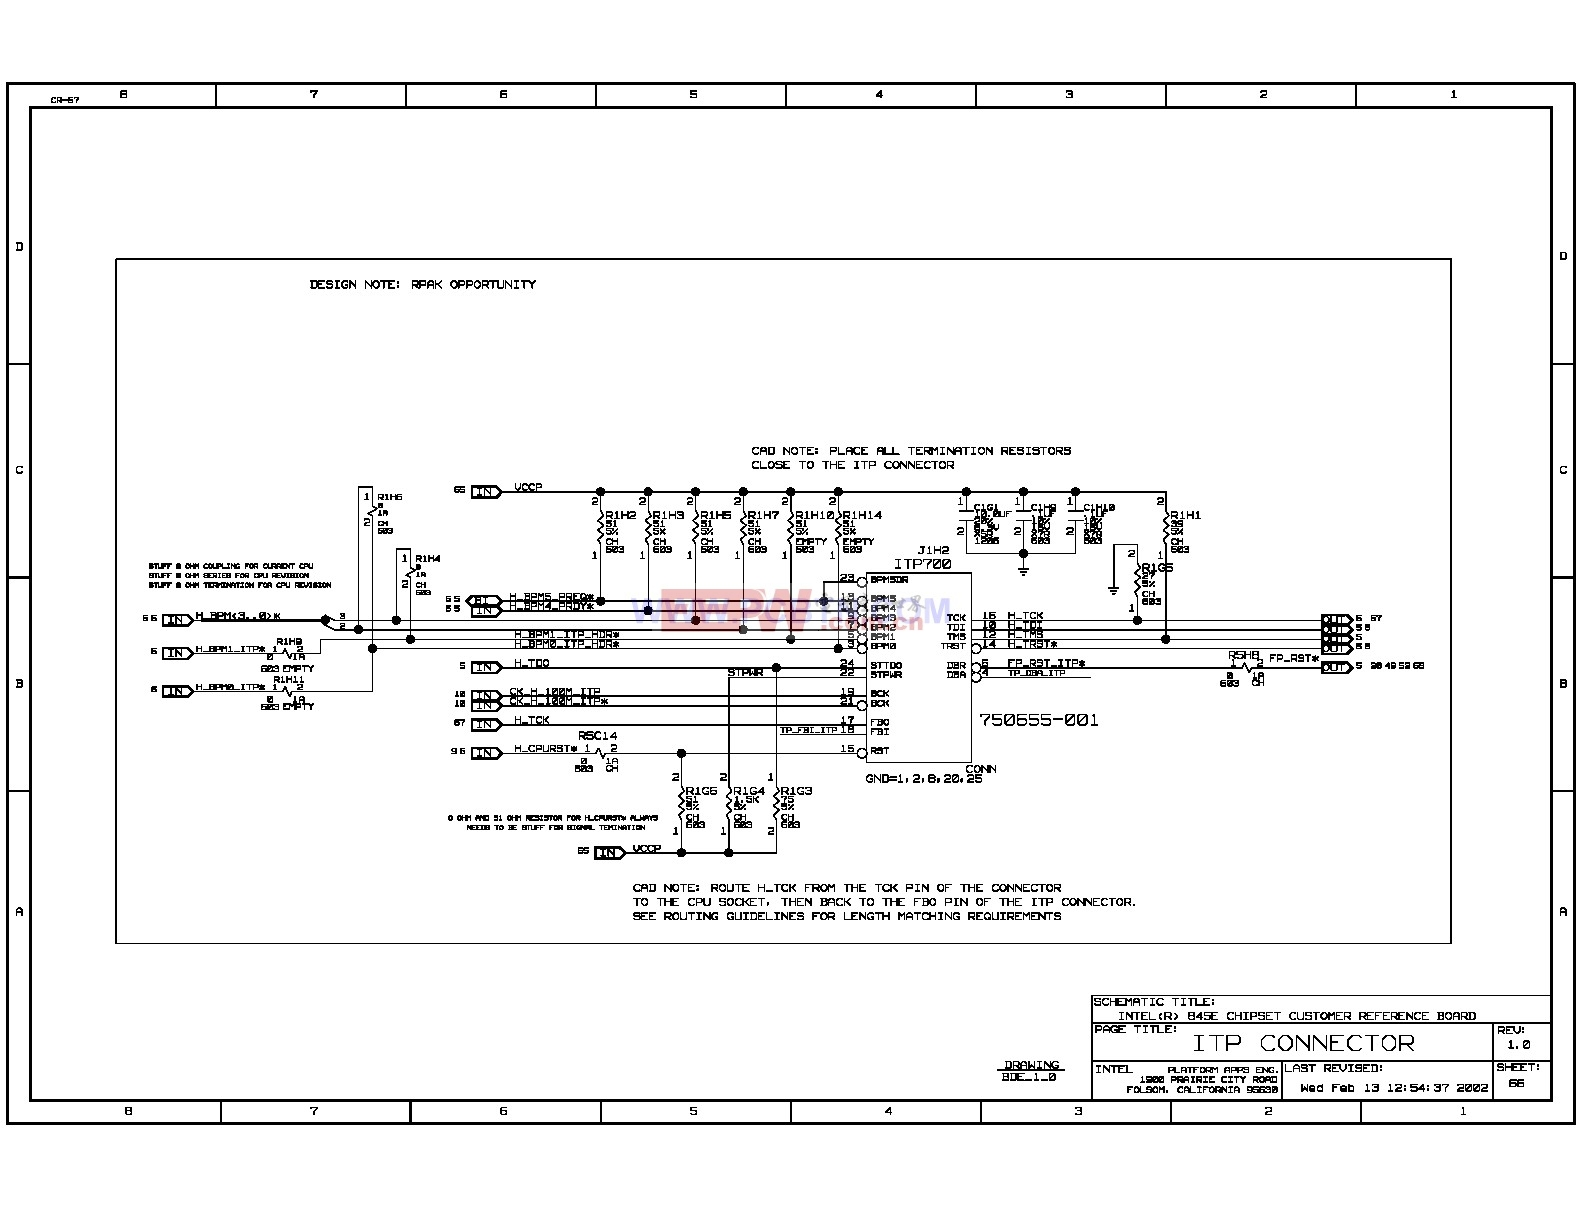 Intel 875p主板調試接口ITP電路圖